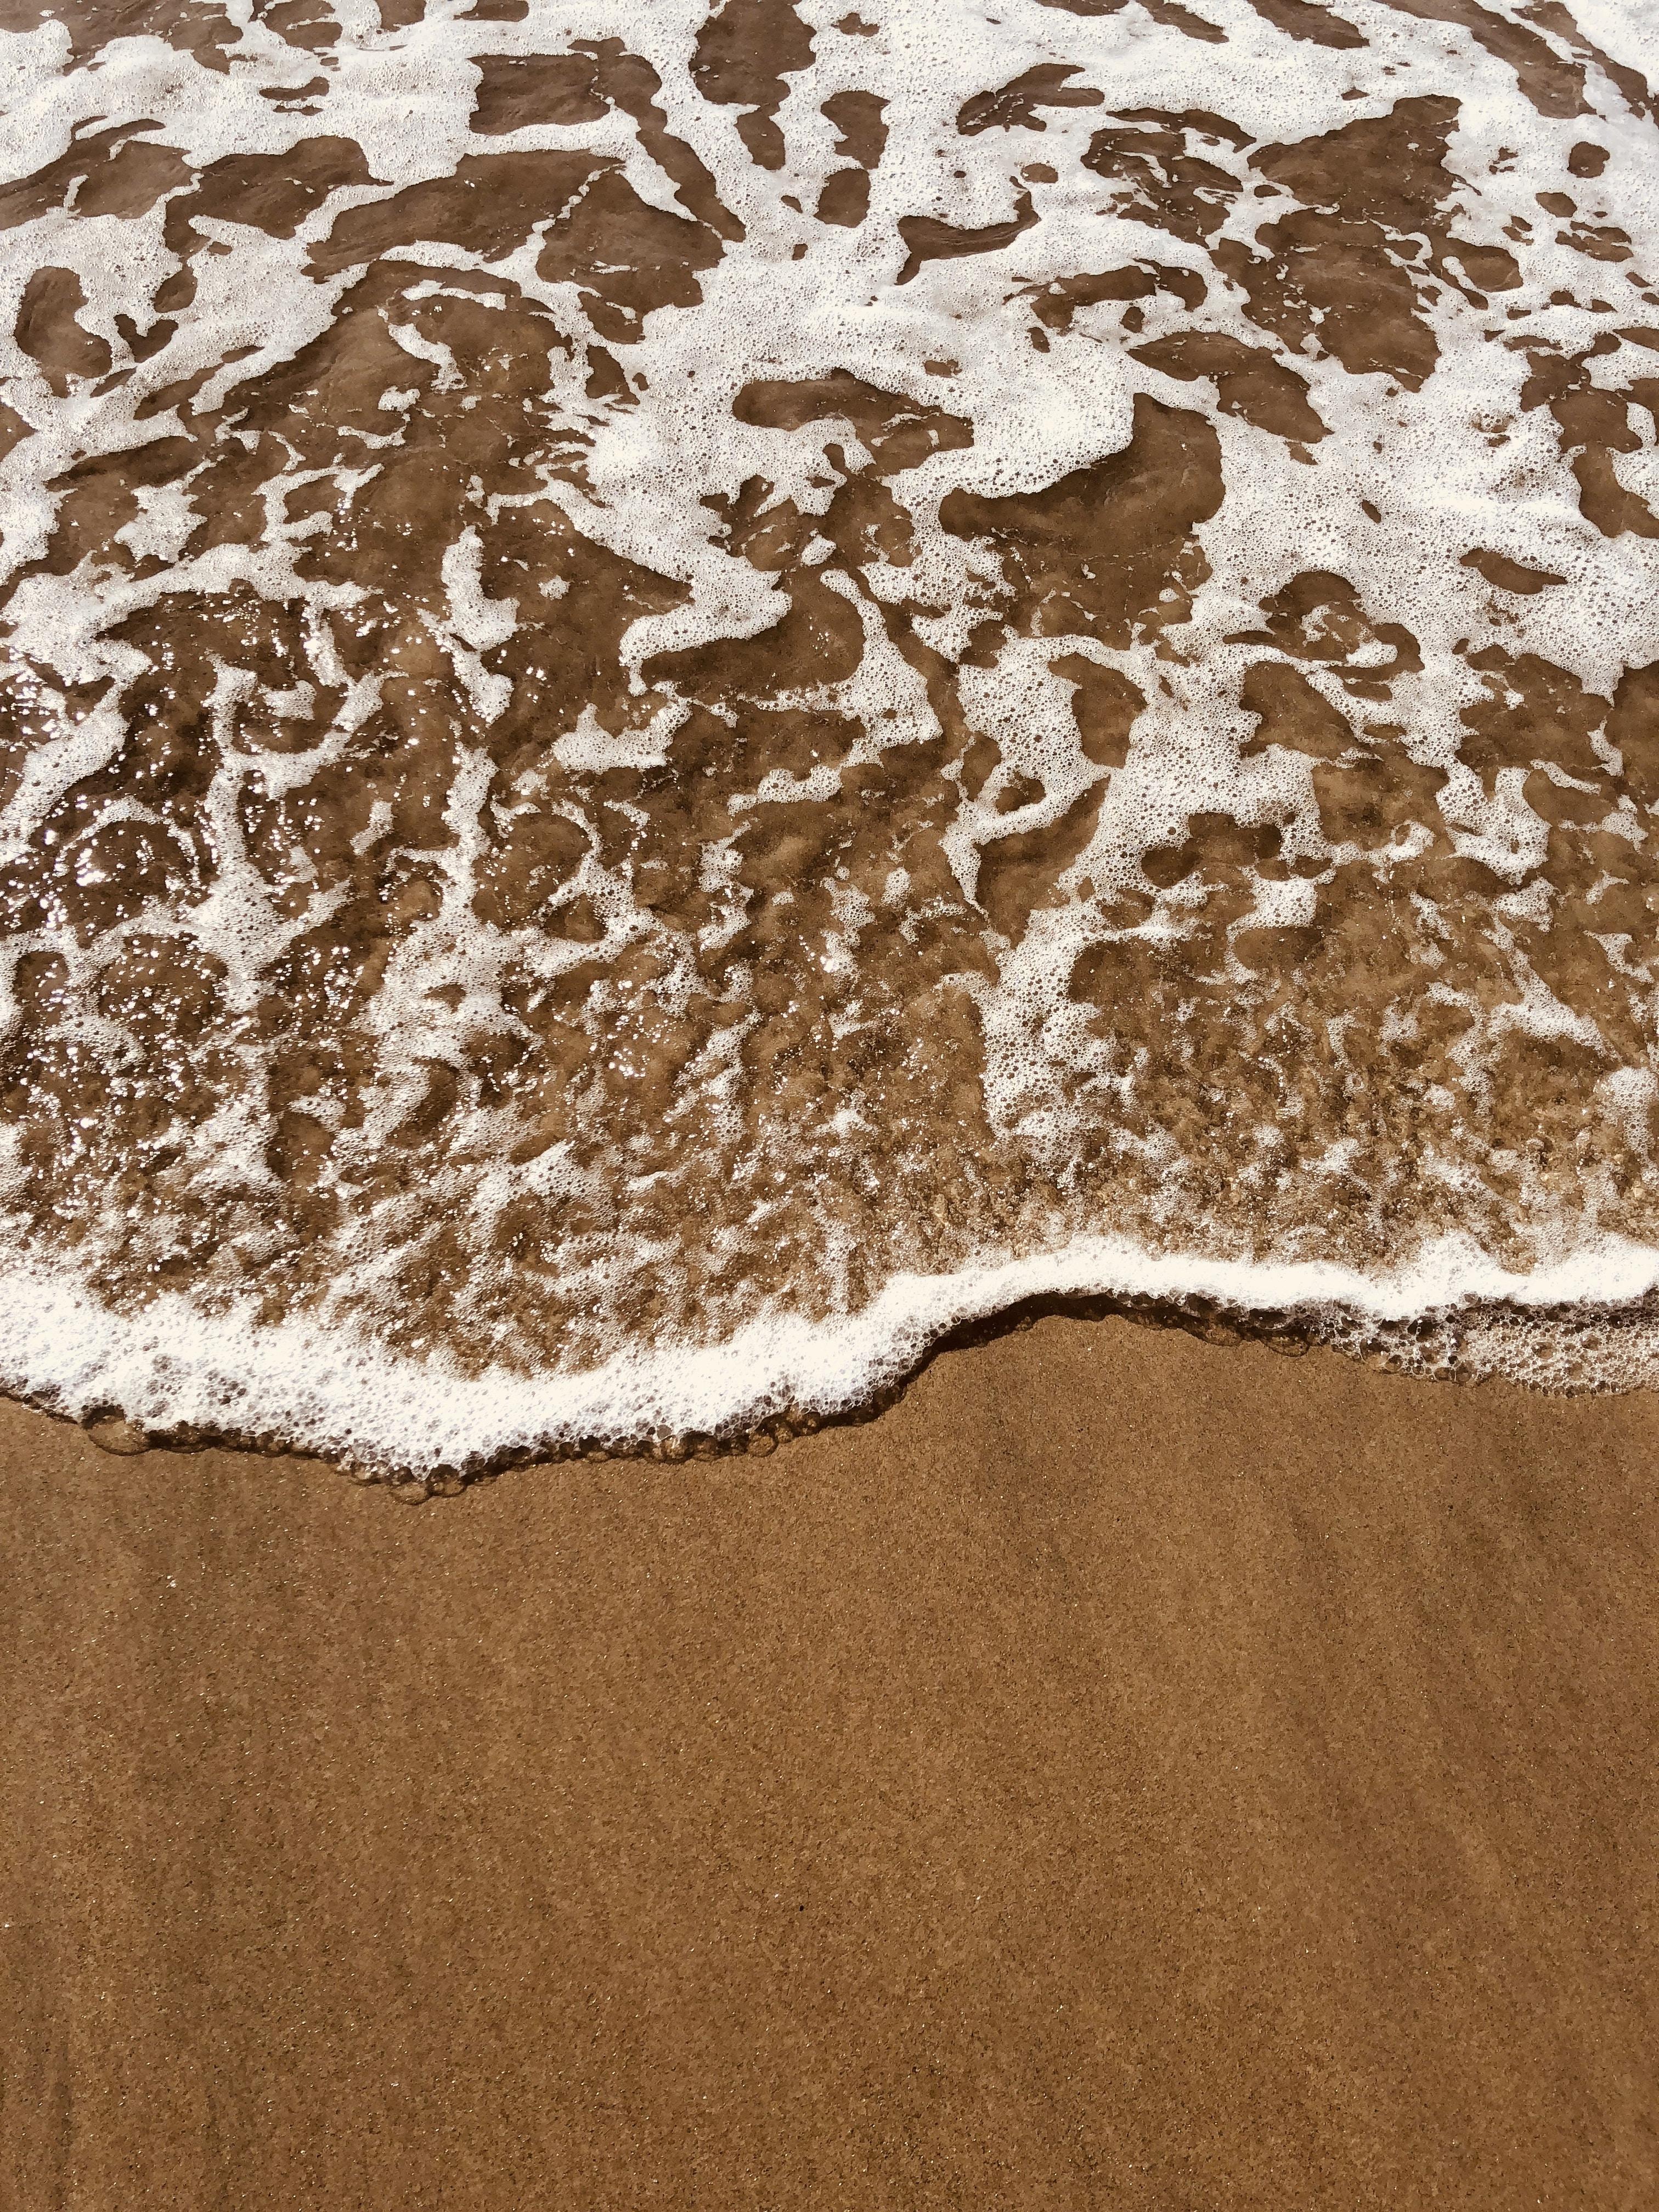 beach shore with ocean wave